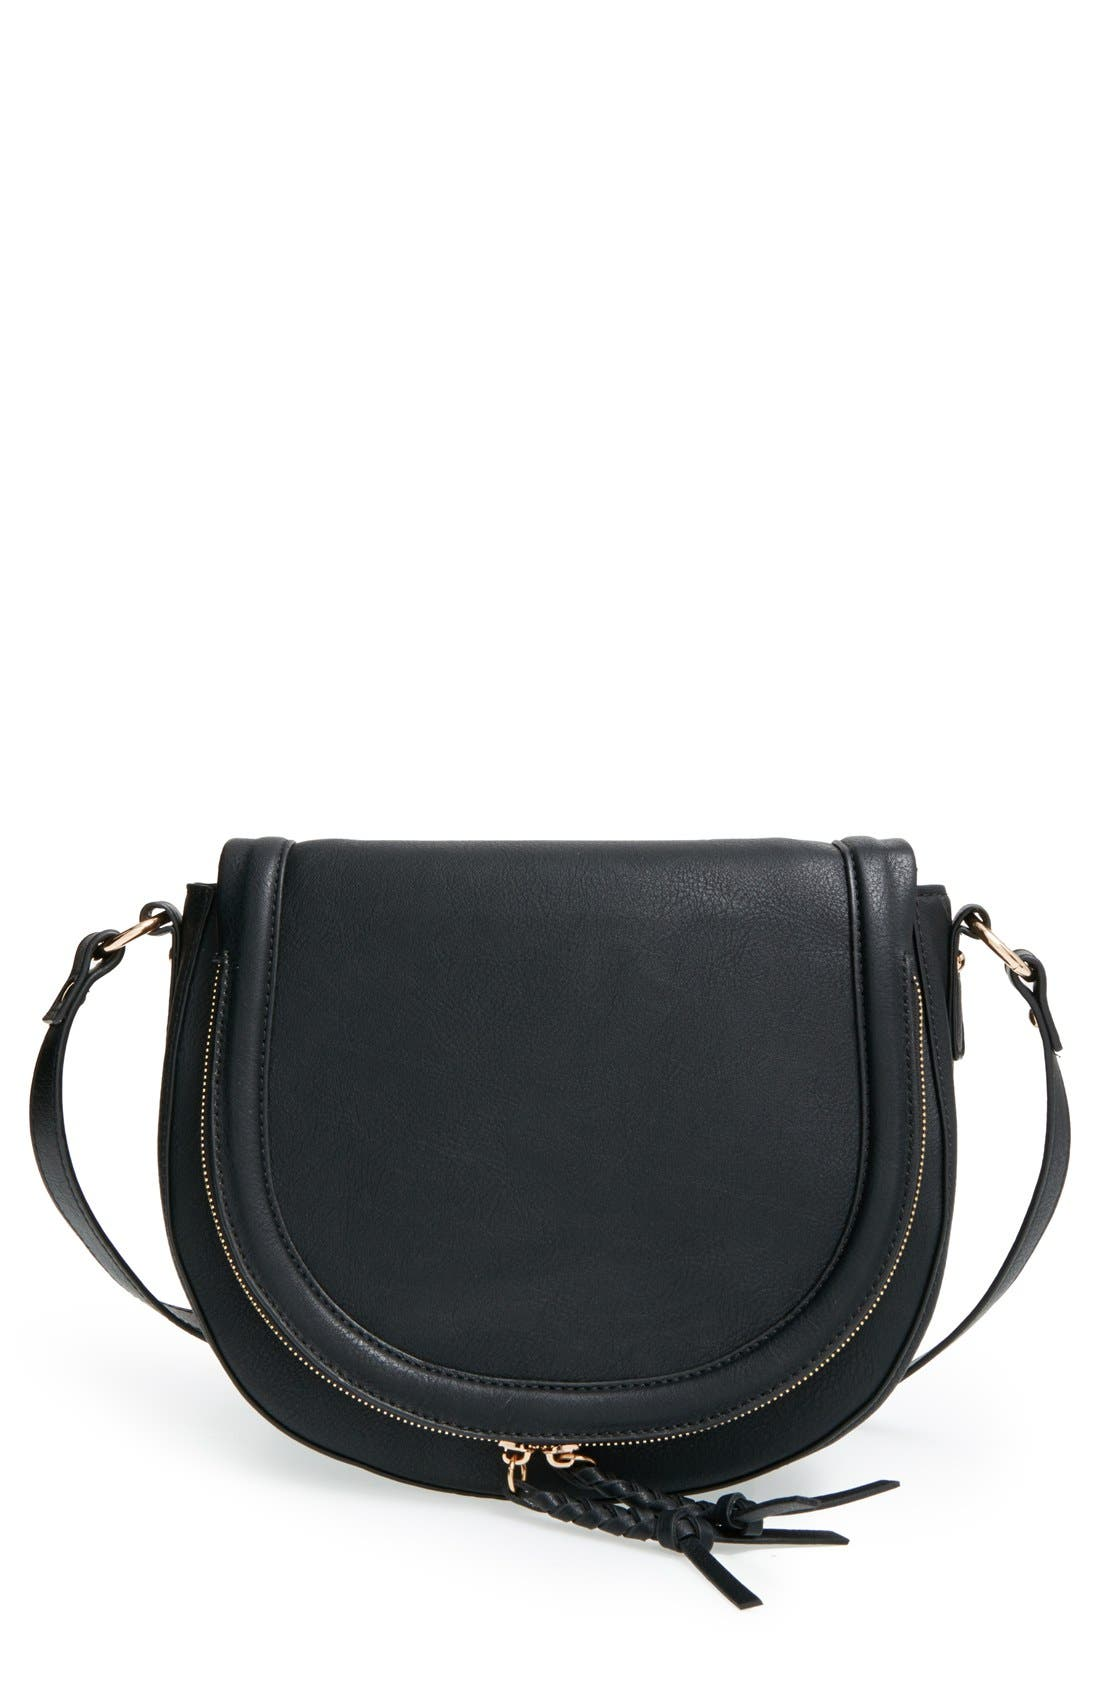 SOLE SOCIETY 'Thalia'Crossbody Bag